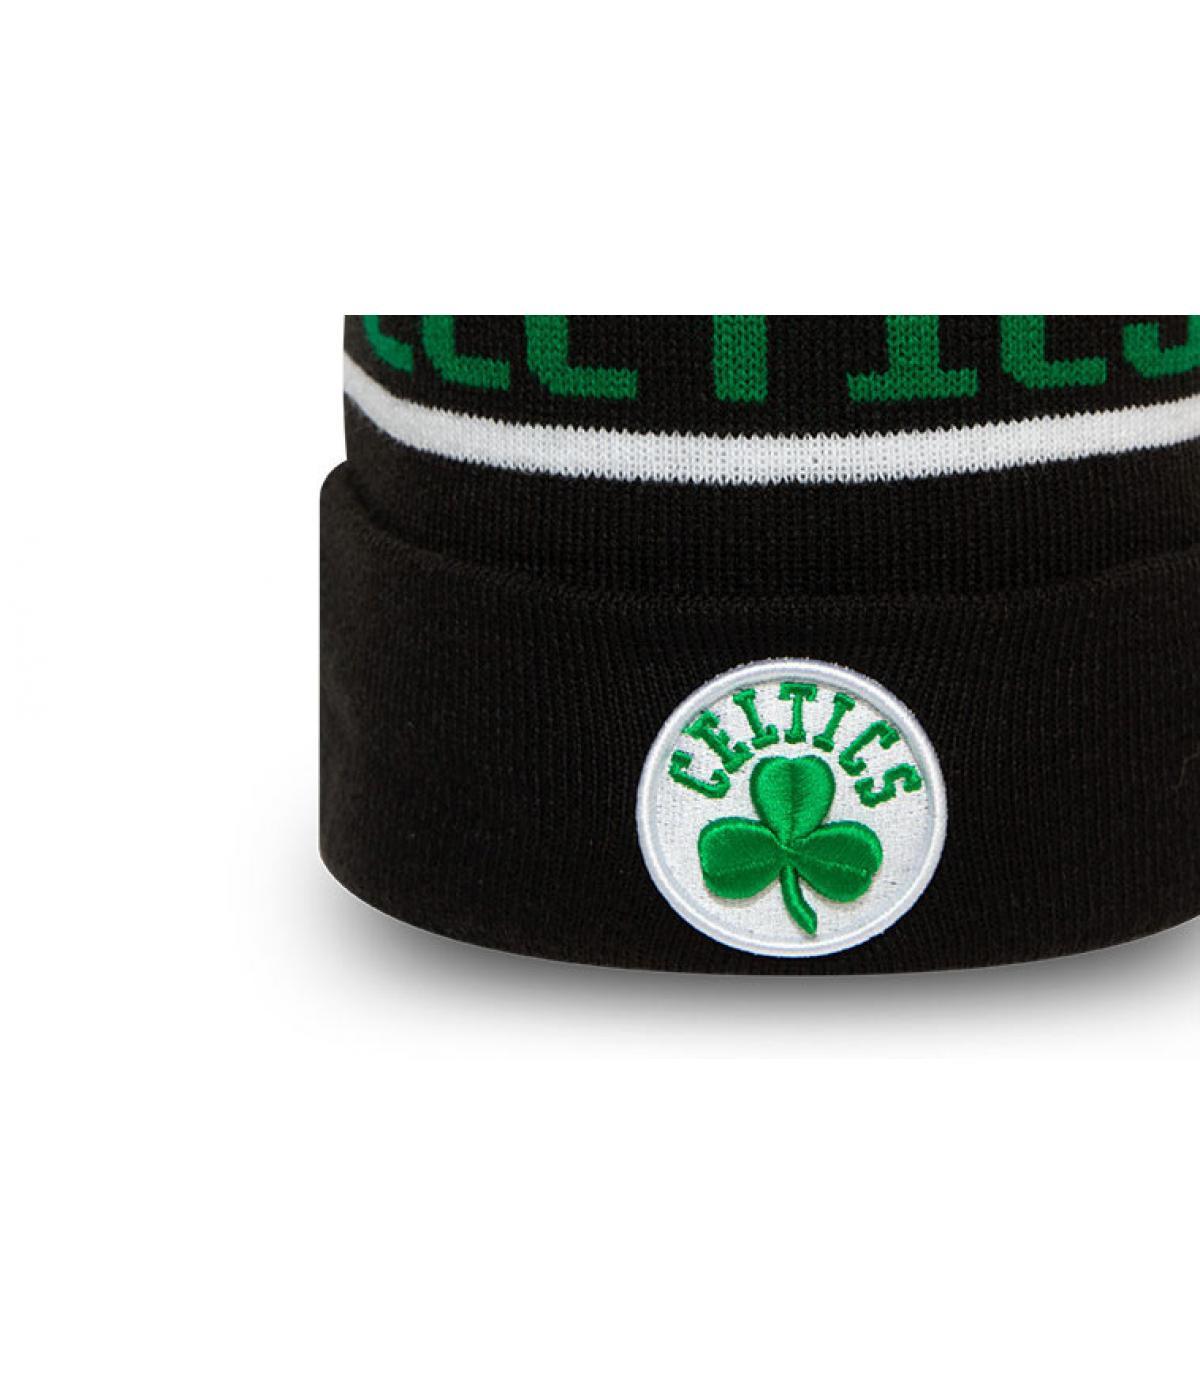 Detalles Bobble Knit Celtics imagen 3